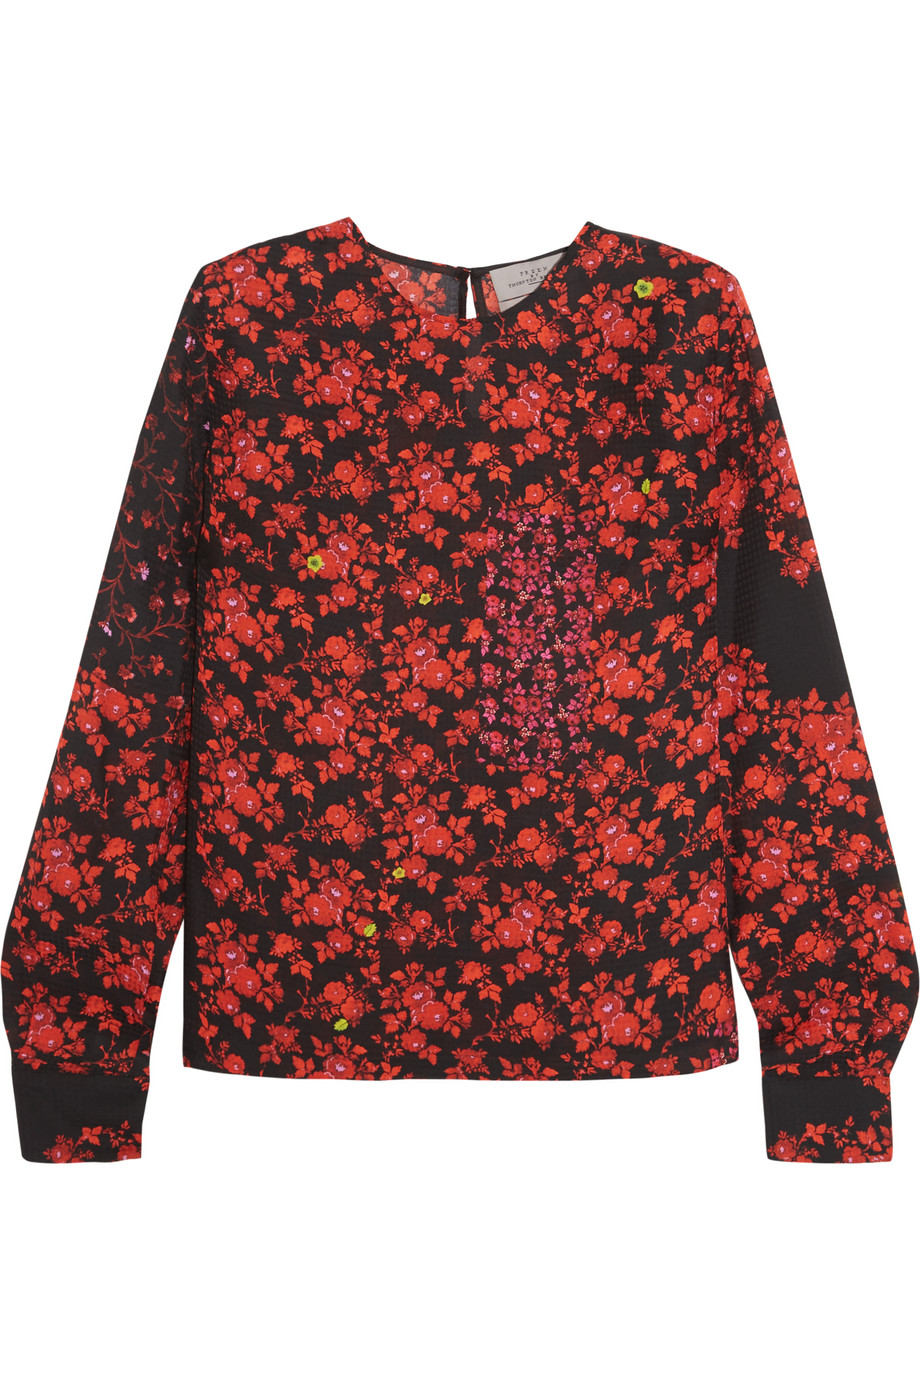 Kira Floral-Print Hammered-Silk Top, Preen by Thornton Bregazzi, Red, Women's, Size: L